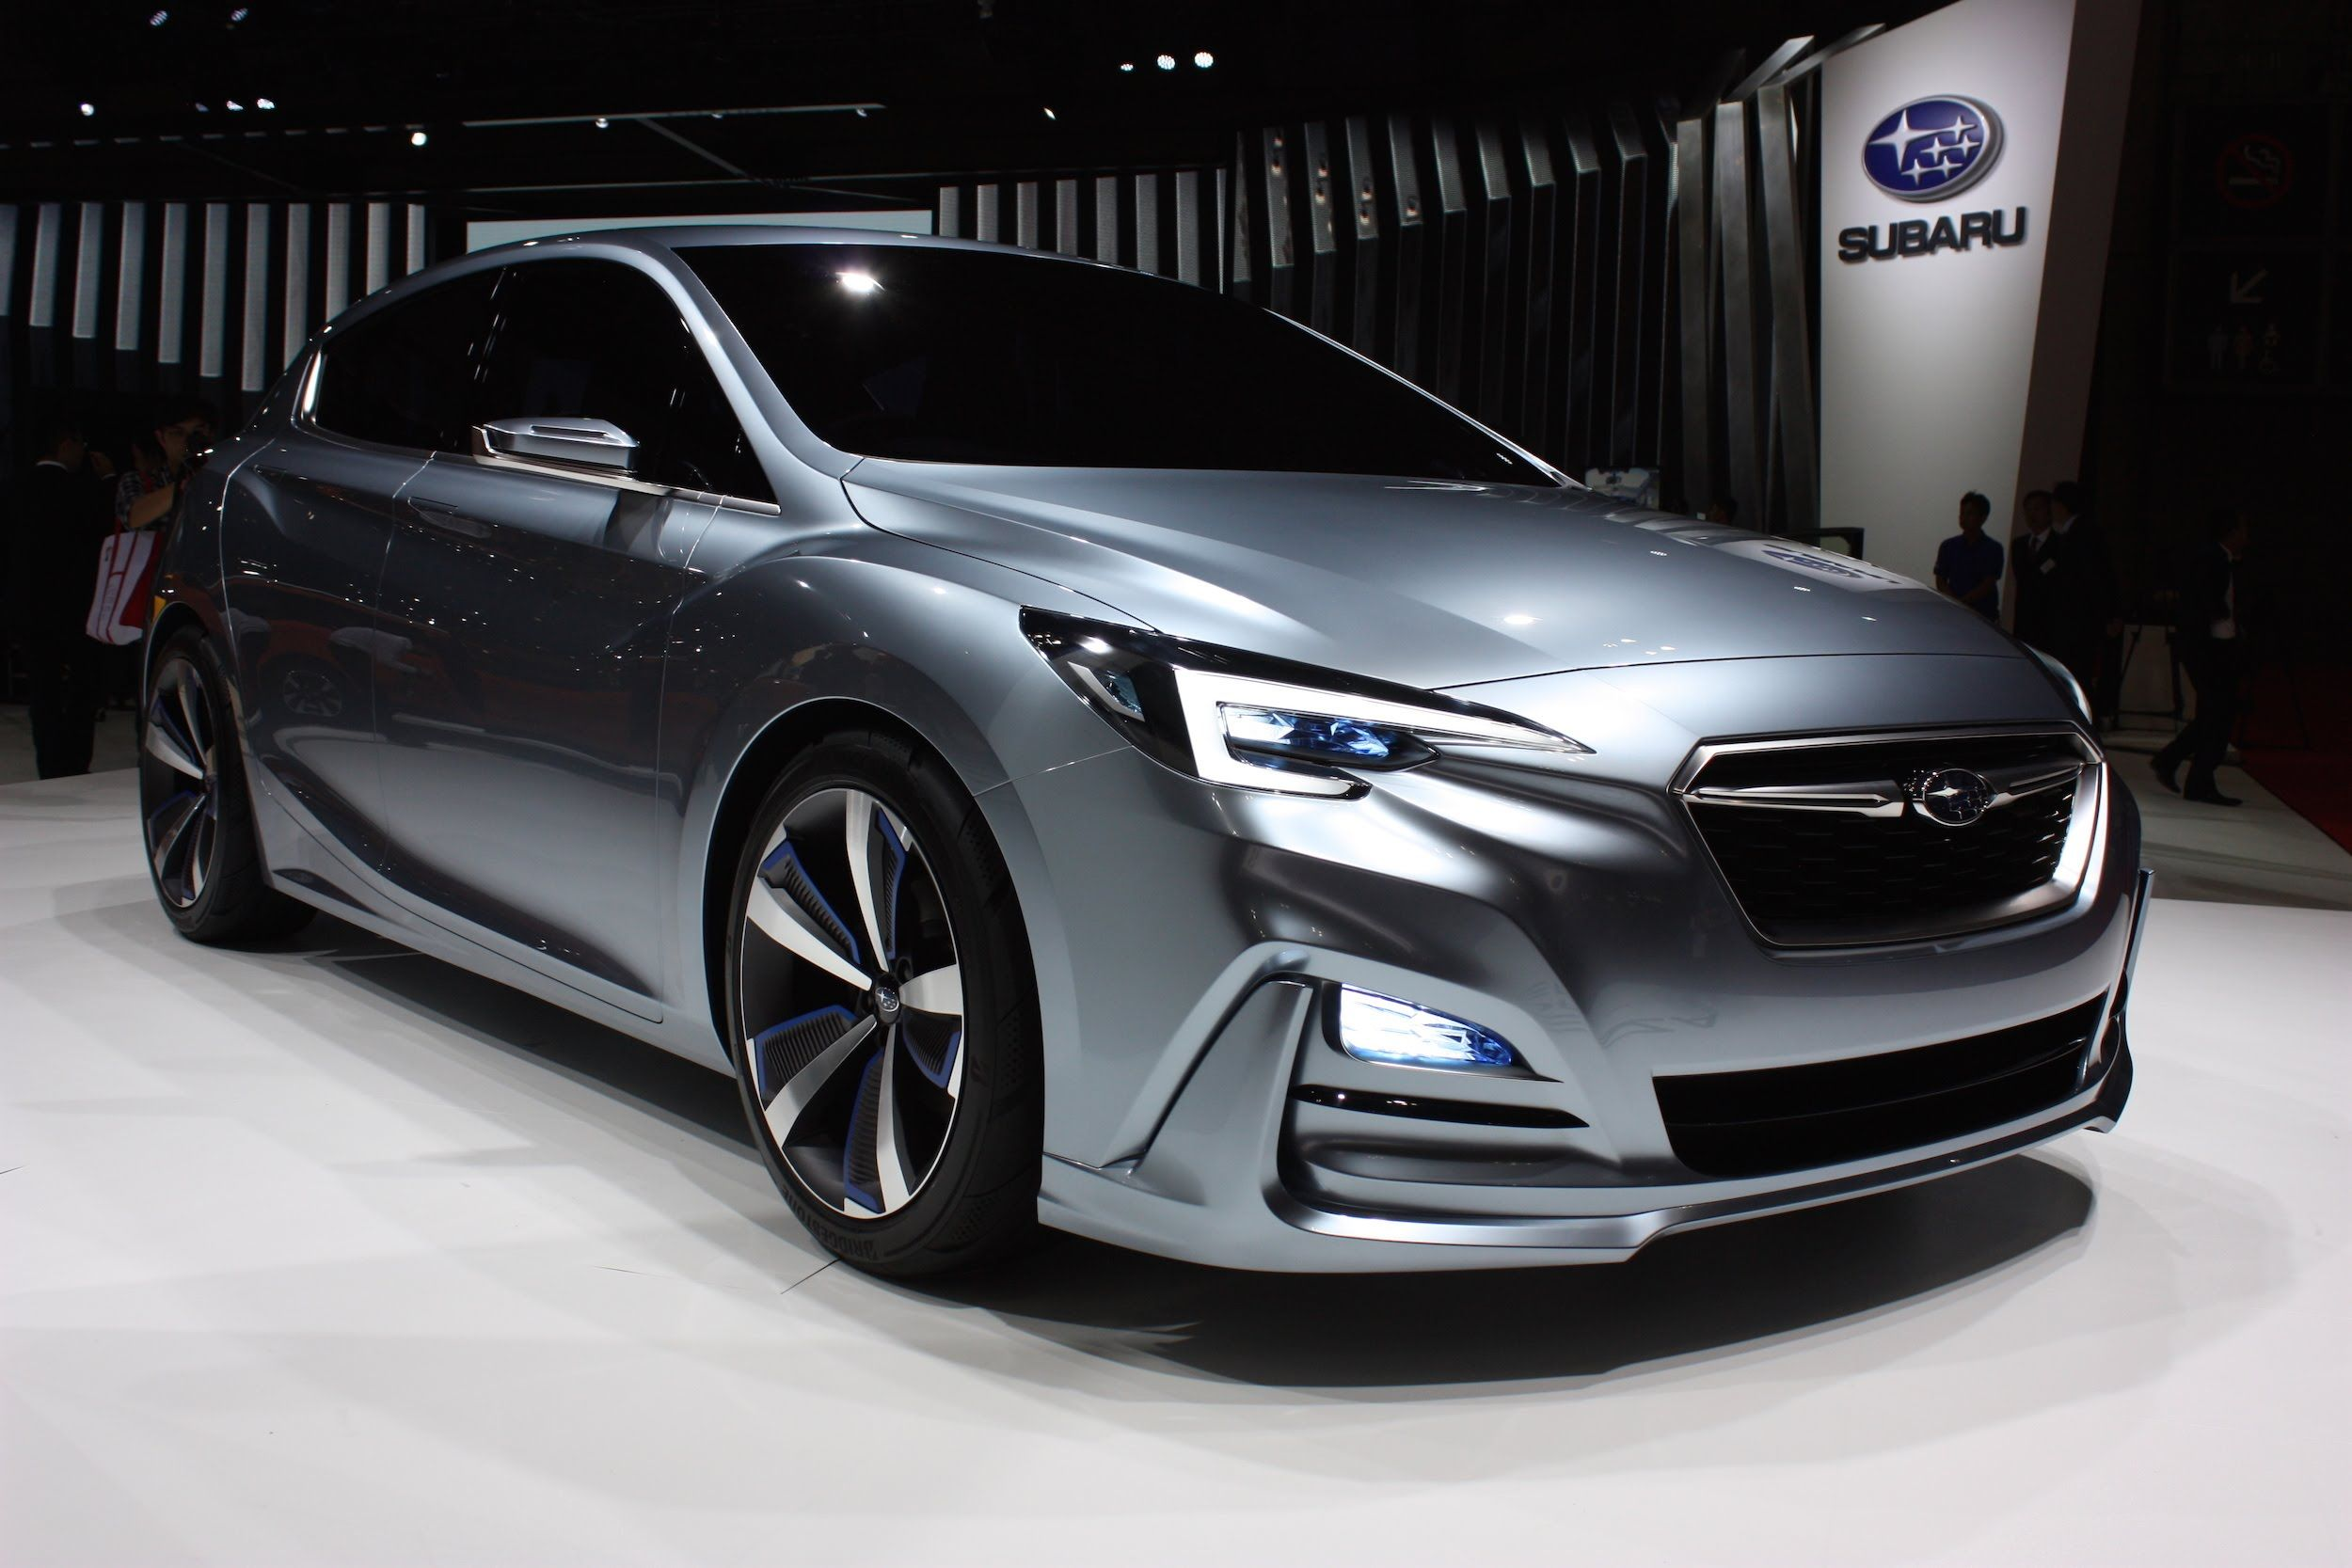 2017 Subaru Impreza 5 Door Concept 2015 Tokyo Motor Show Subaru Sport Subaru Impreza Subaru Wrx Engine